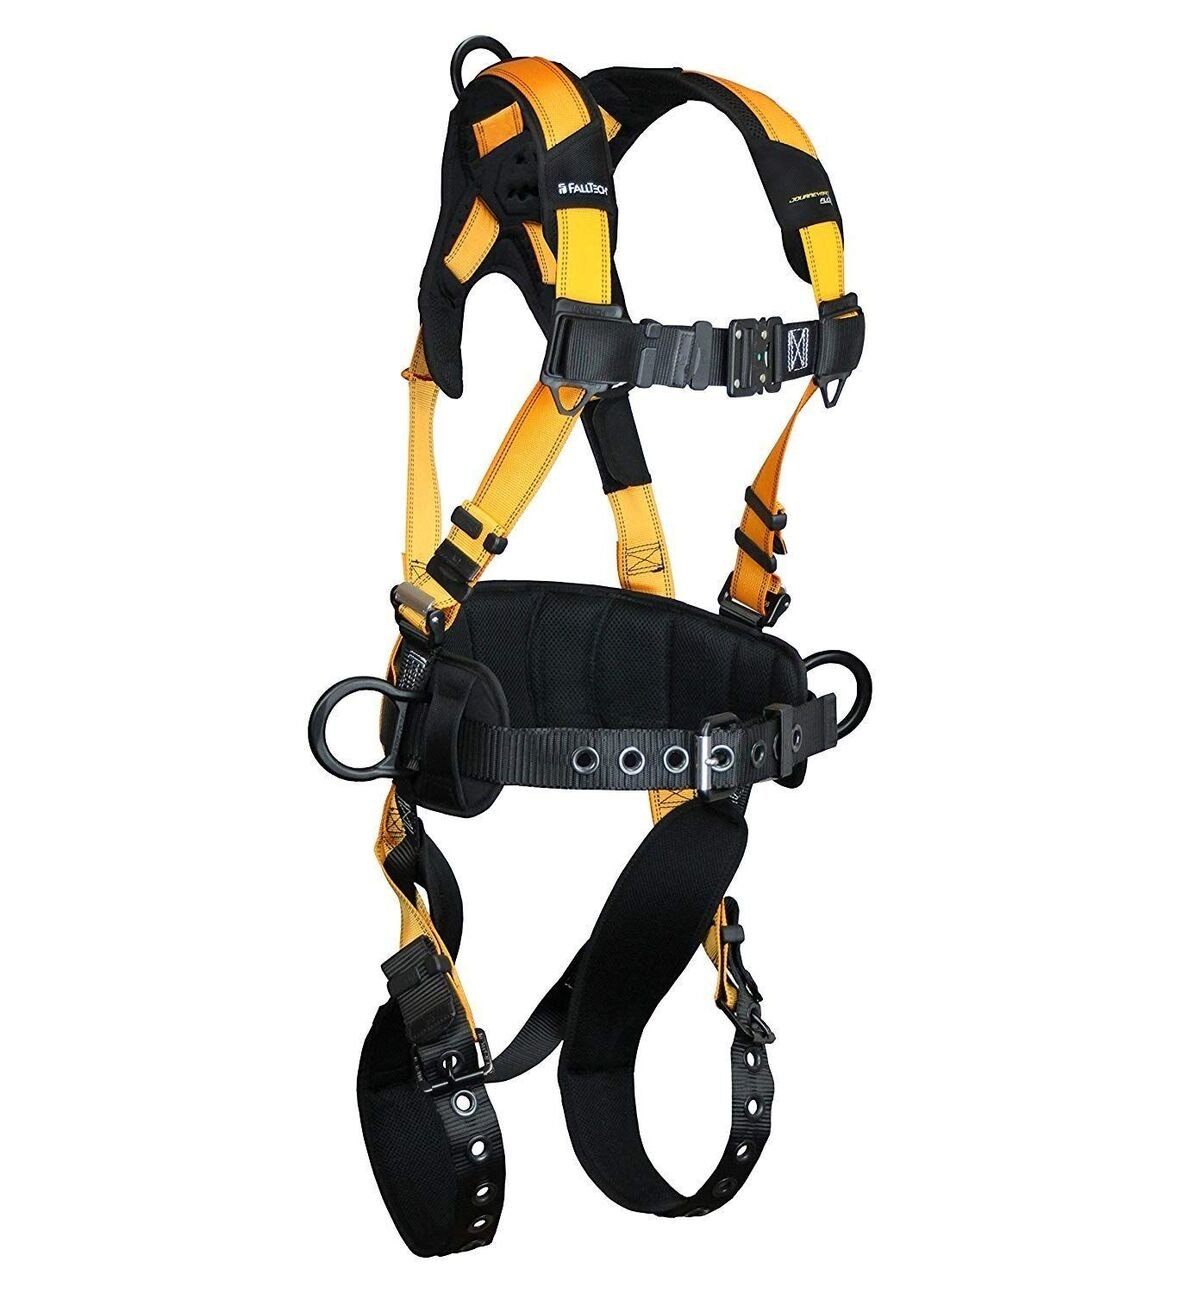 Falltech 7035BXL Journeyman Flex Harness, Extra Large